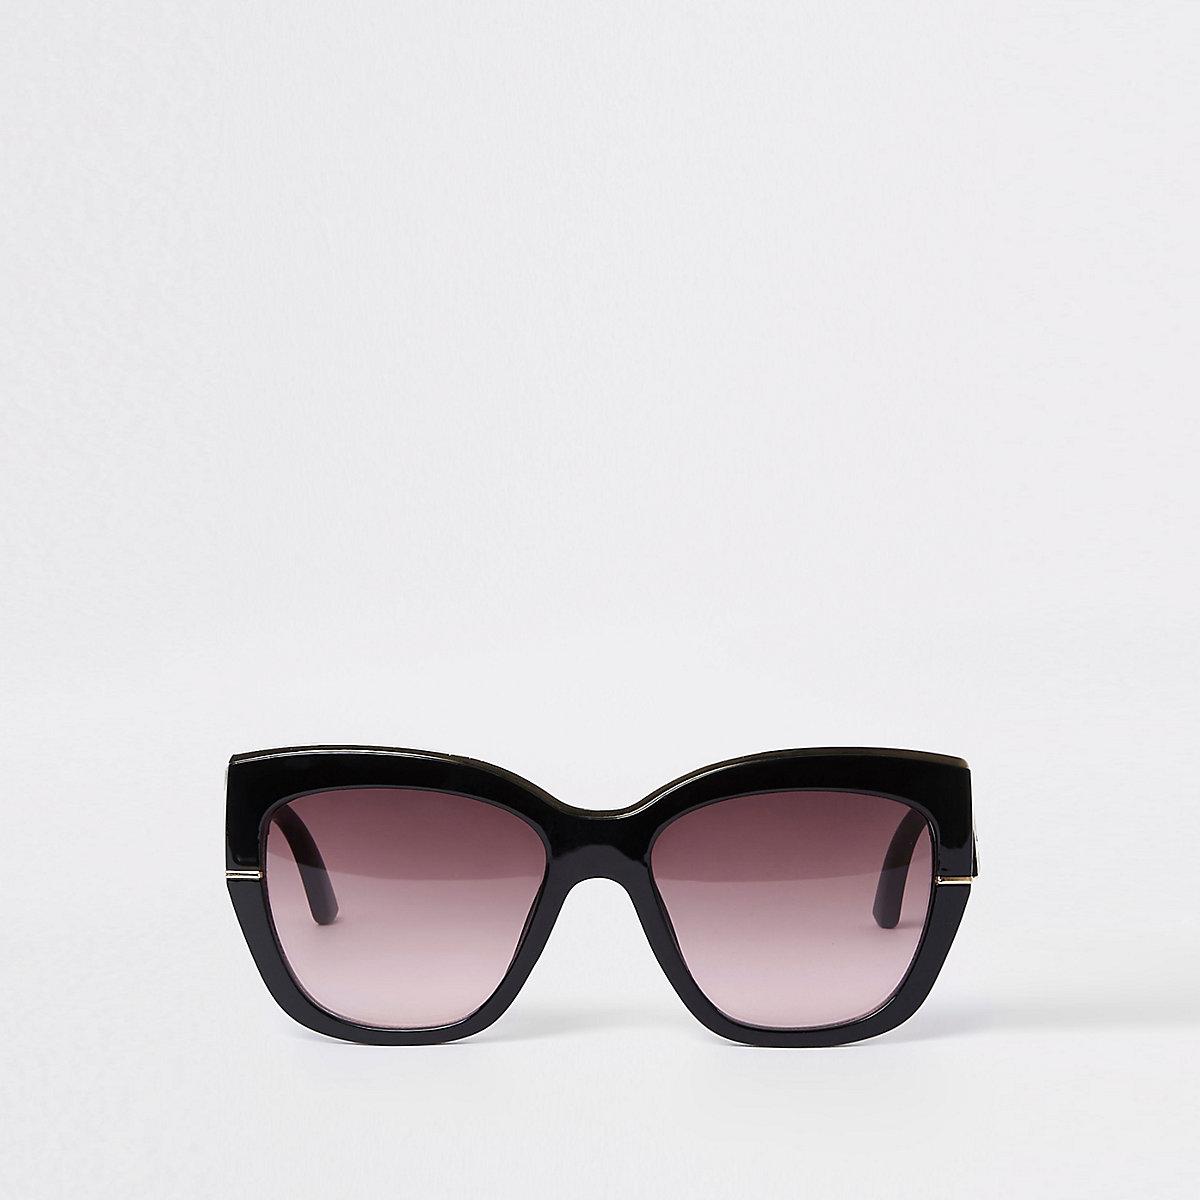 Black gold tone trim glam sunglasses